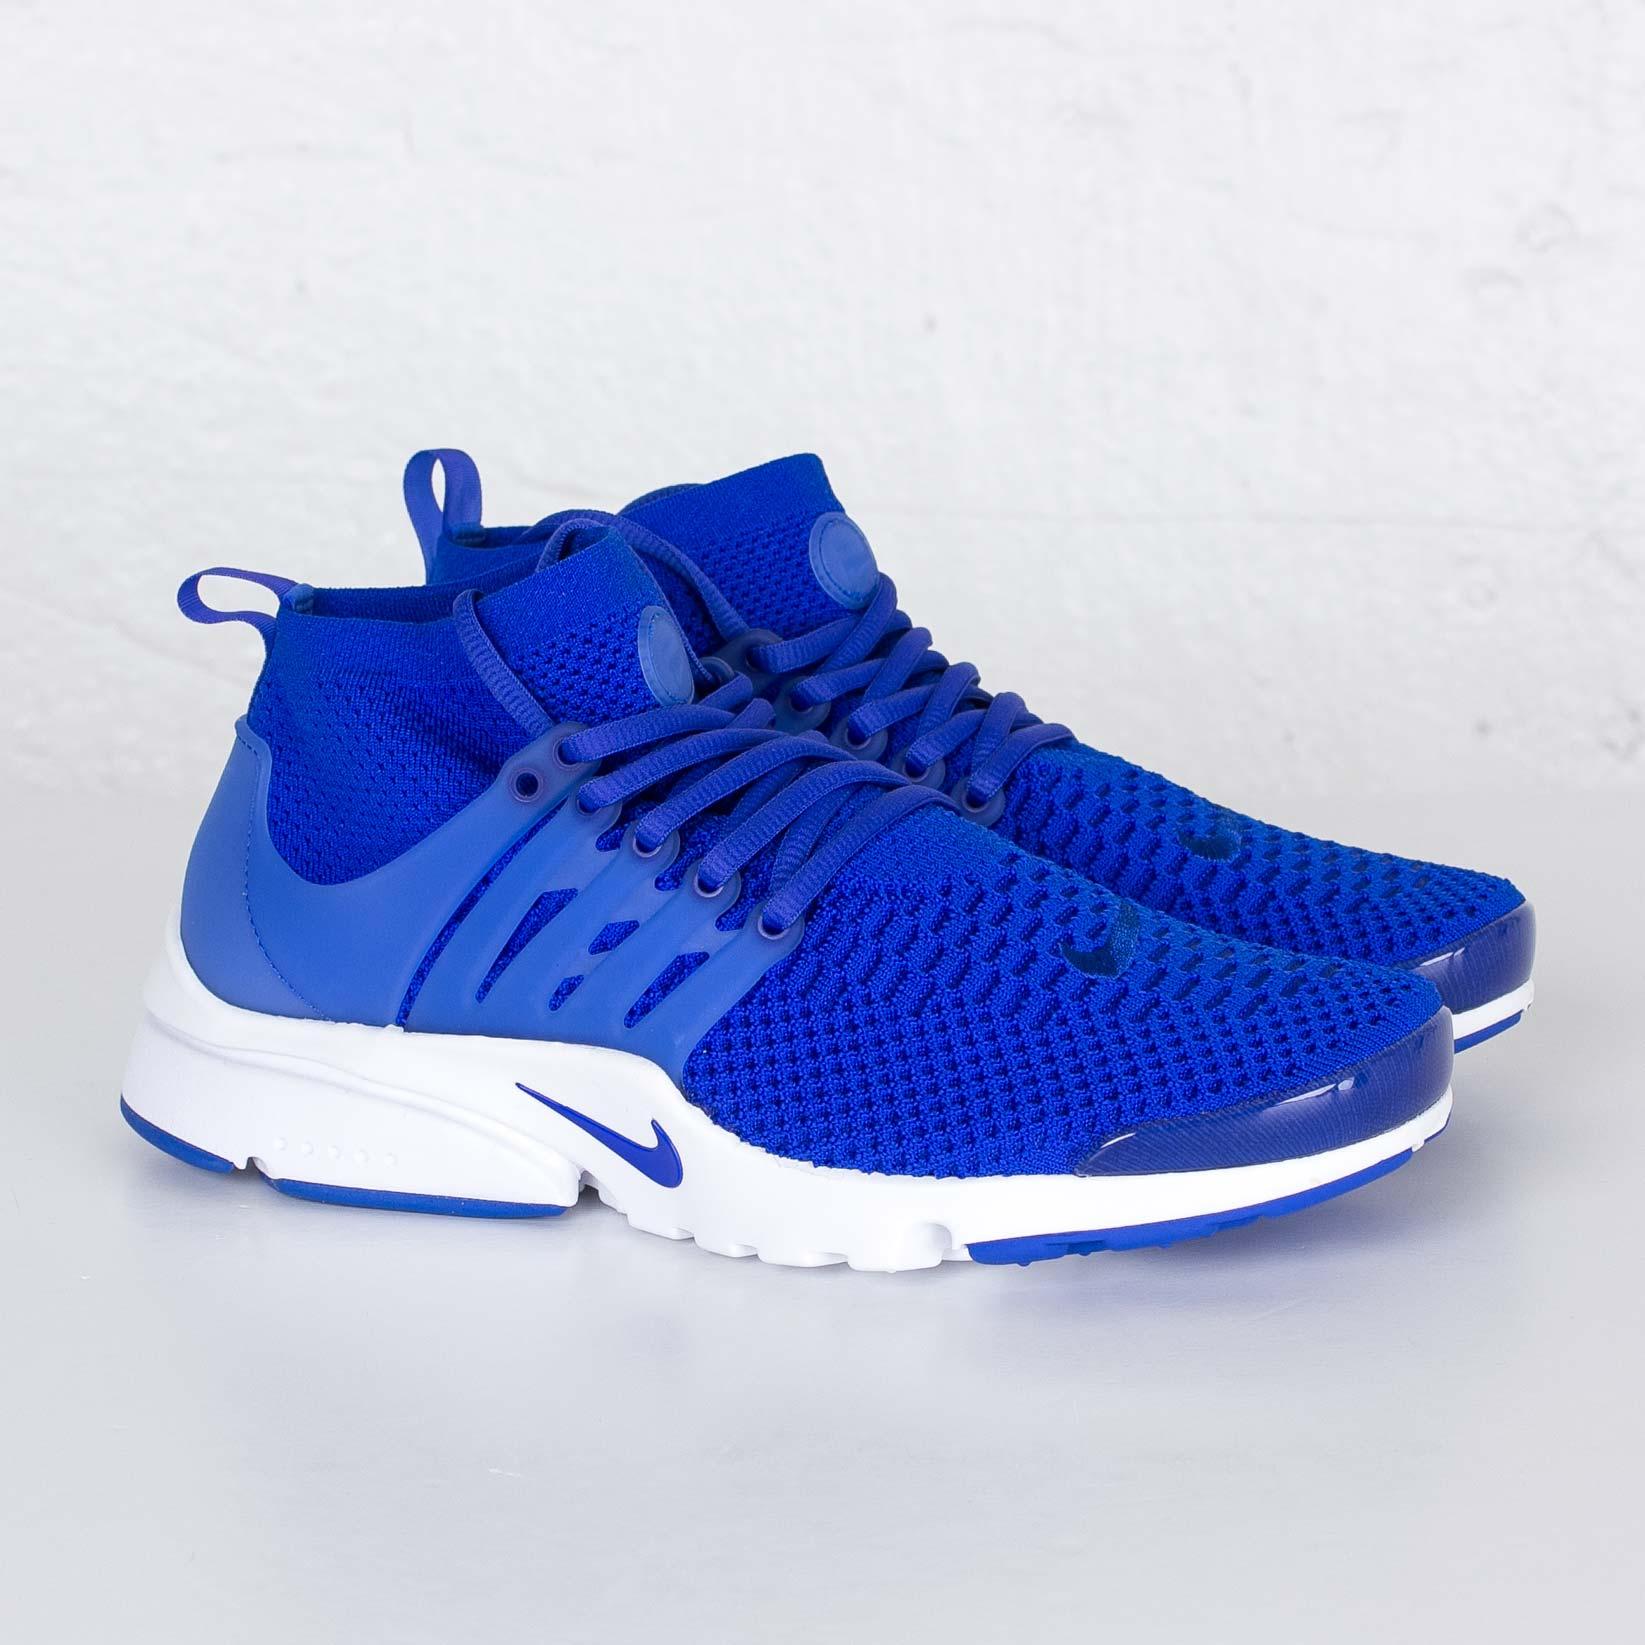 nouveau concept 6b314 8f324 Nike Air Presto Flyknit Ultra - 835570-400 - Sneakersnstuff ...